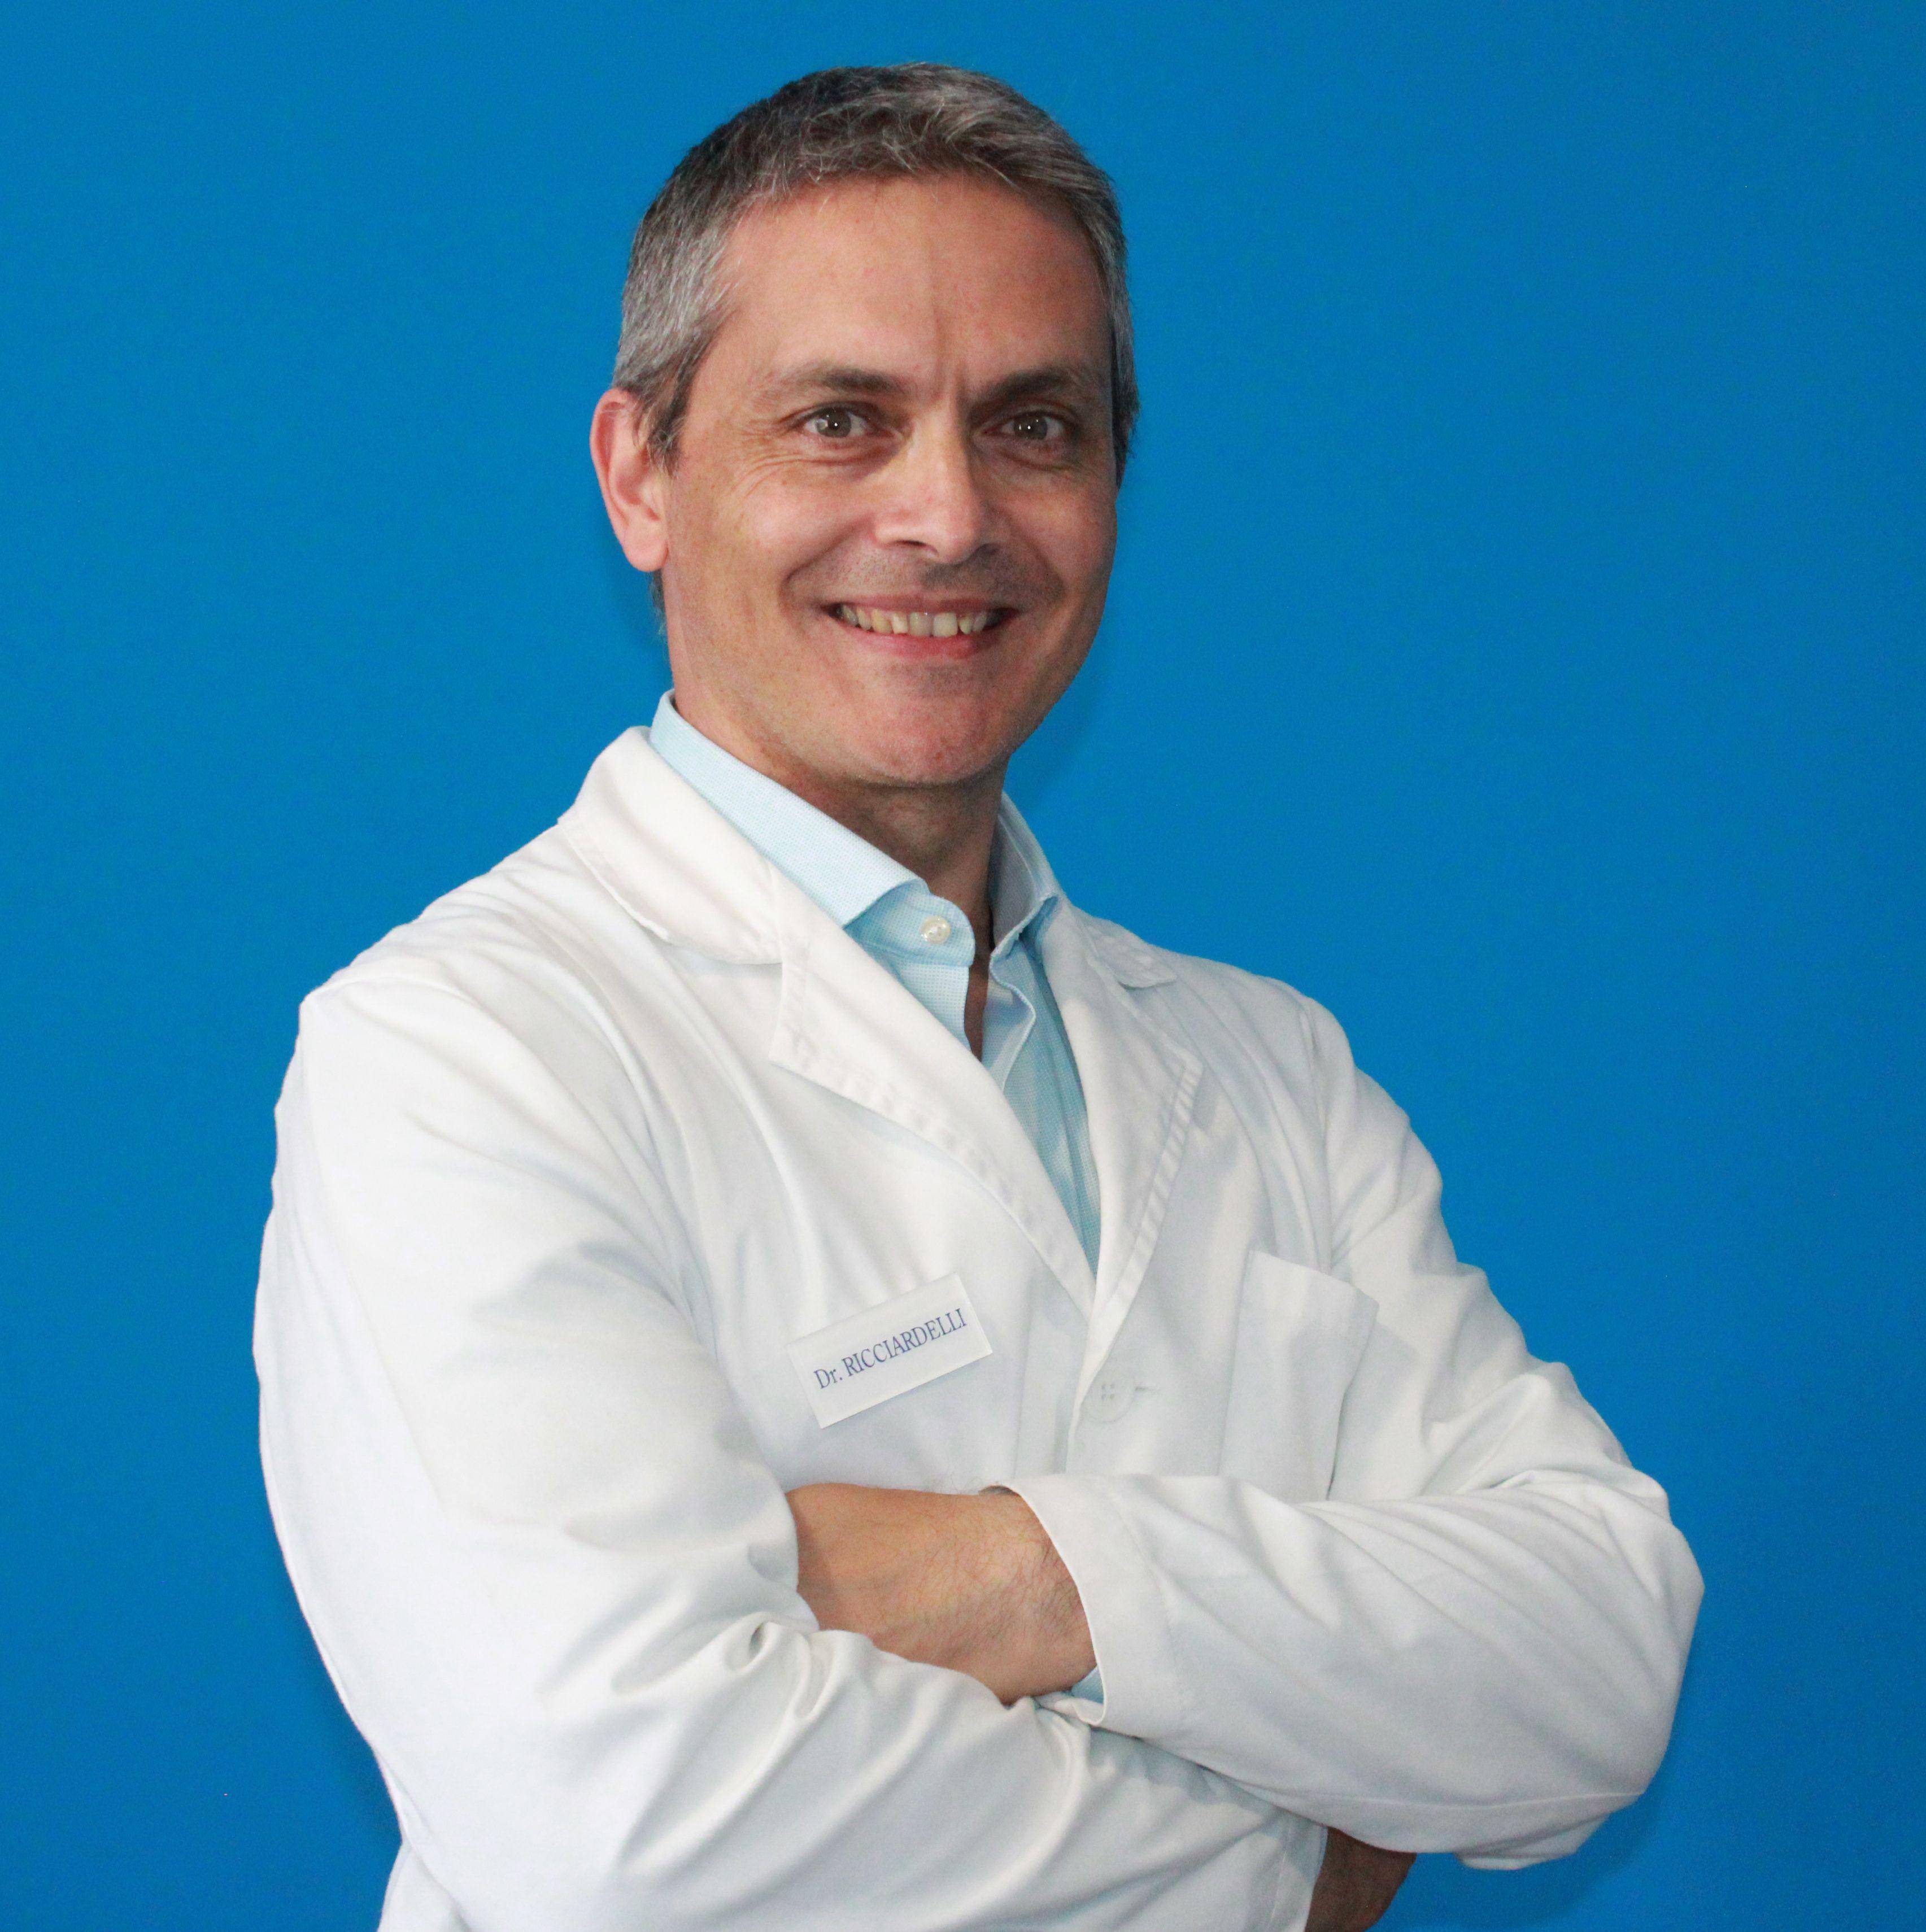 Diego Ricciardelli